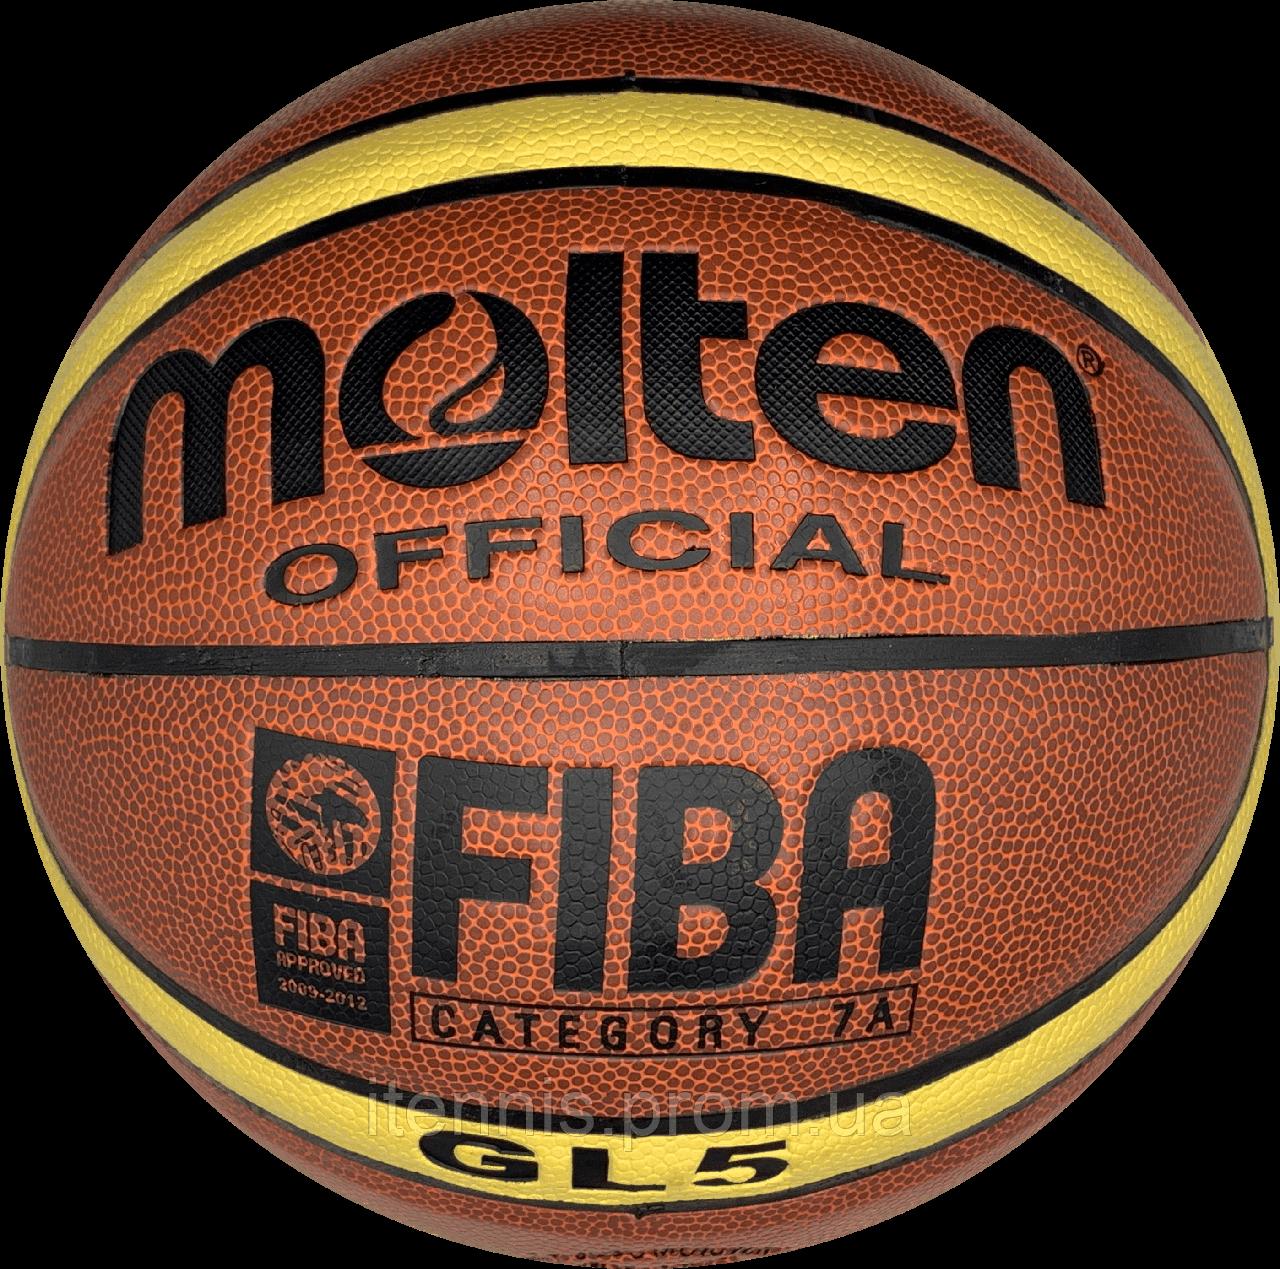 Баскетбольный мяч Molten GL5 NEW! (BA-4254)